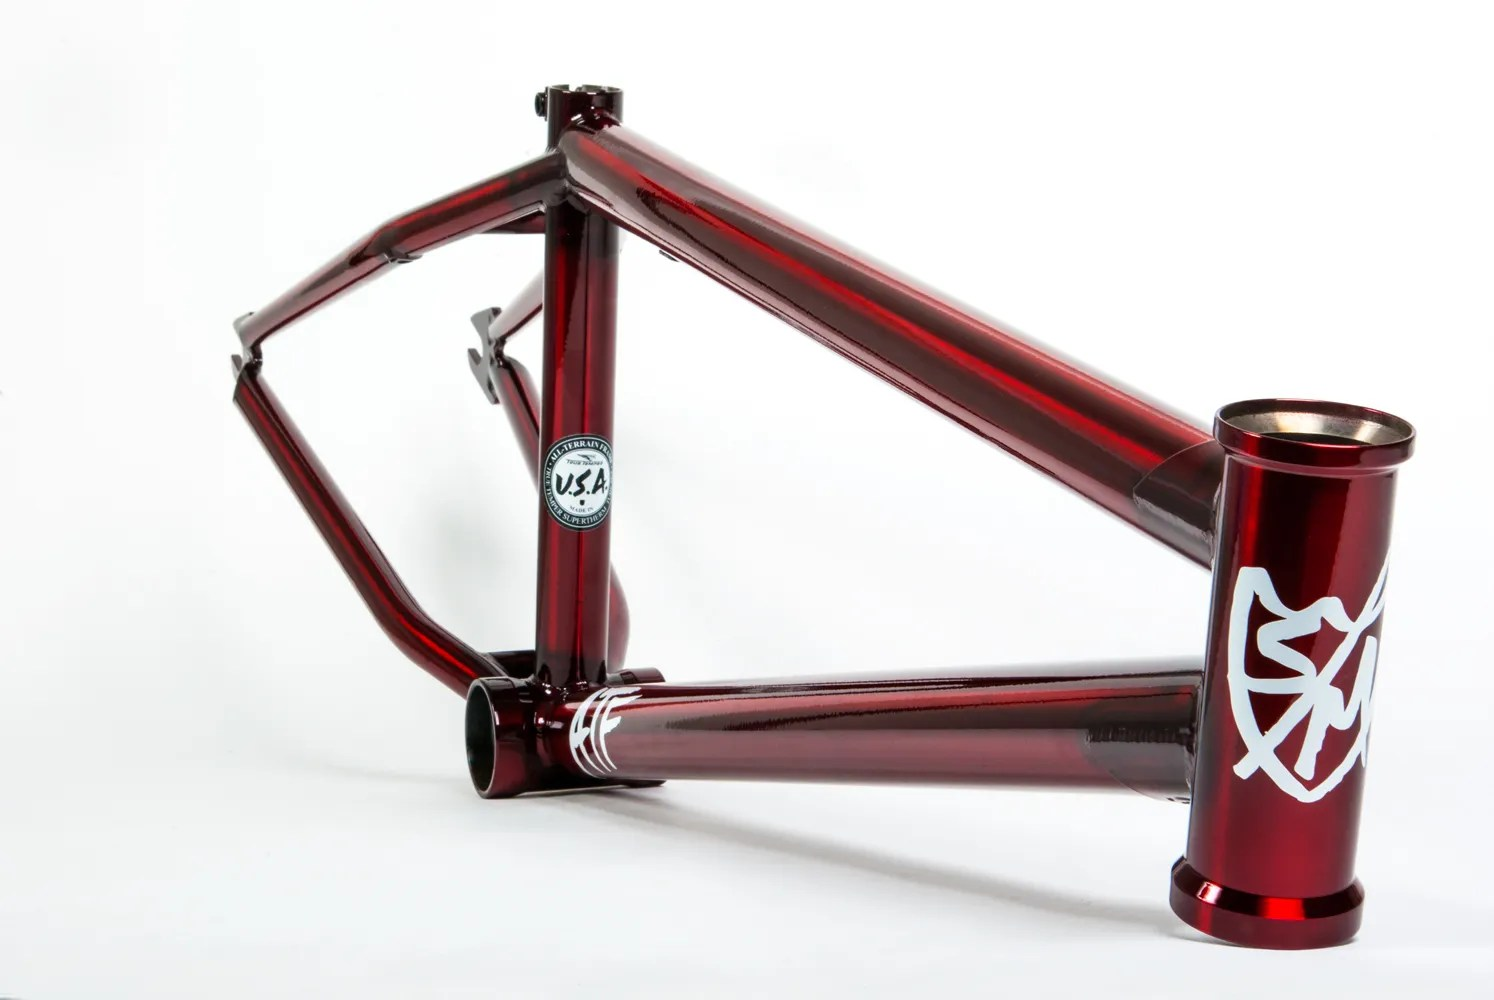 SM BIKES ATF FRAME 205 TRANS RED BMX BIKE CLEAR FIT CULT LTF